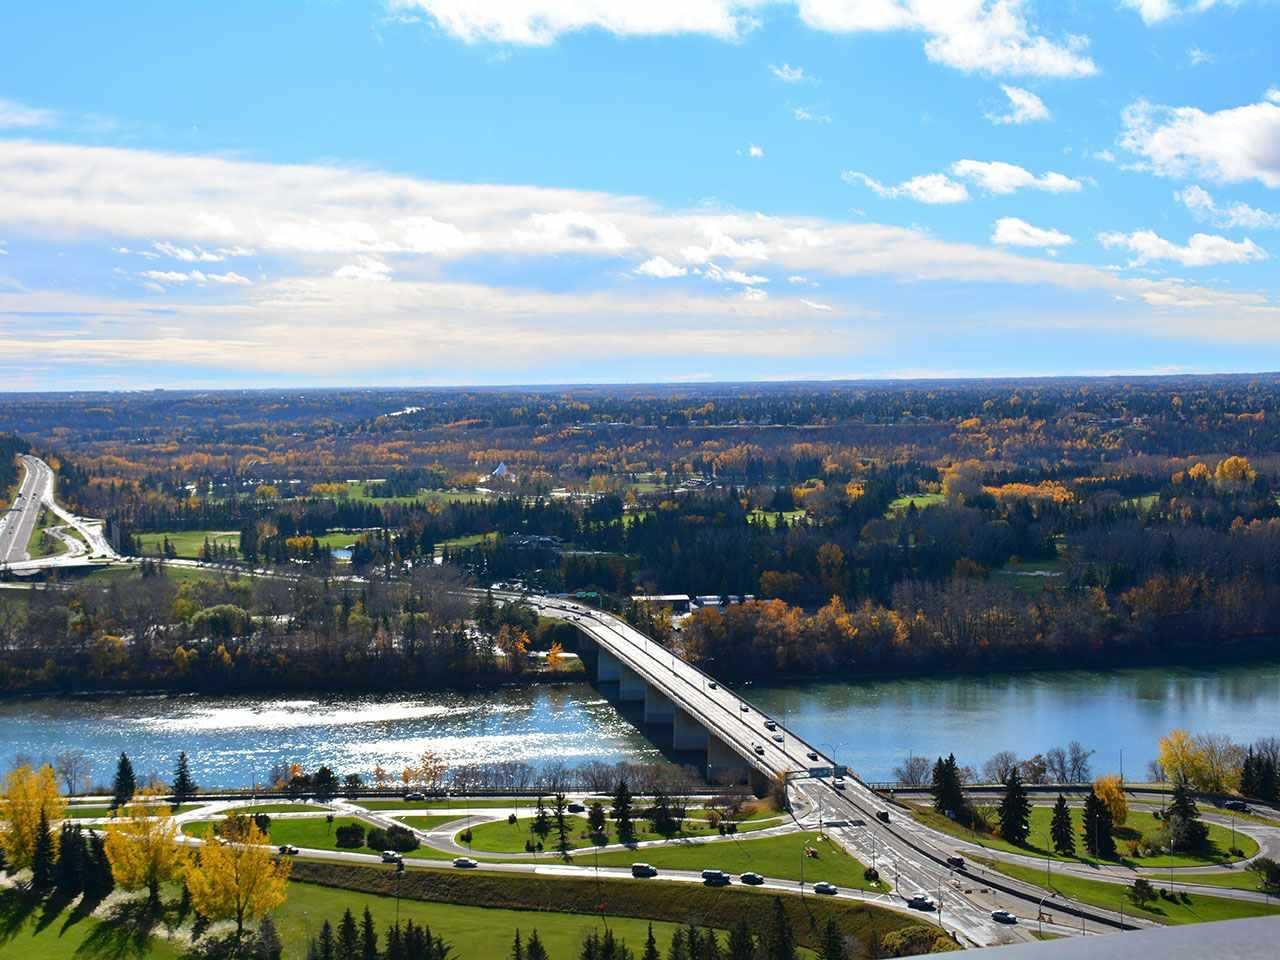 Main Photo: 2303 10011 123 Street NW in Edmonton: Zone 12 Condo for sale : MLS®# E4131400